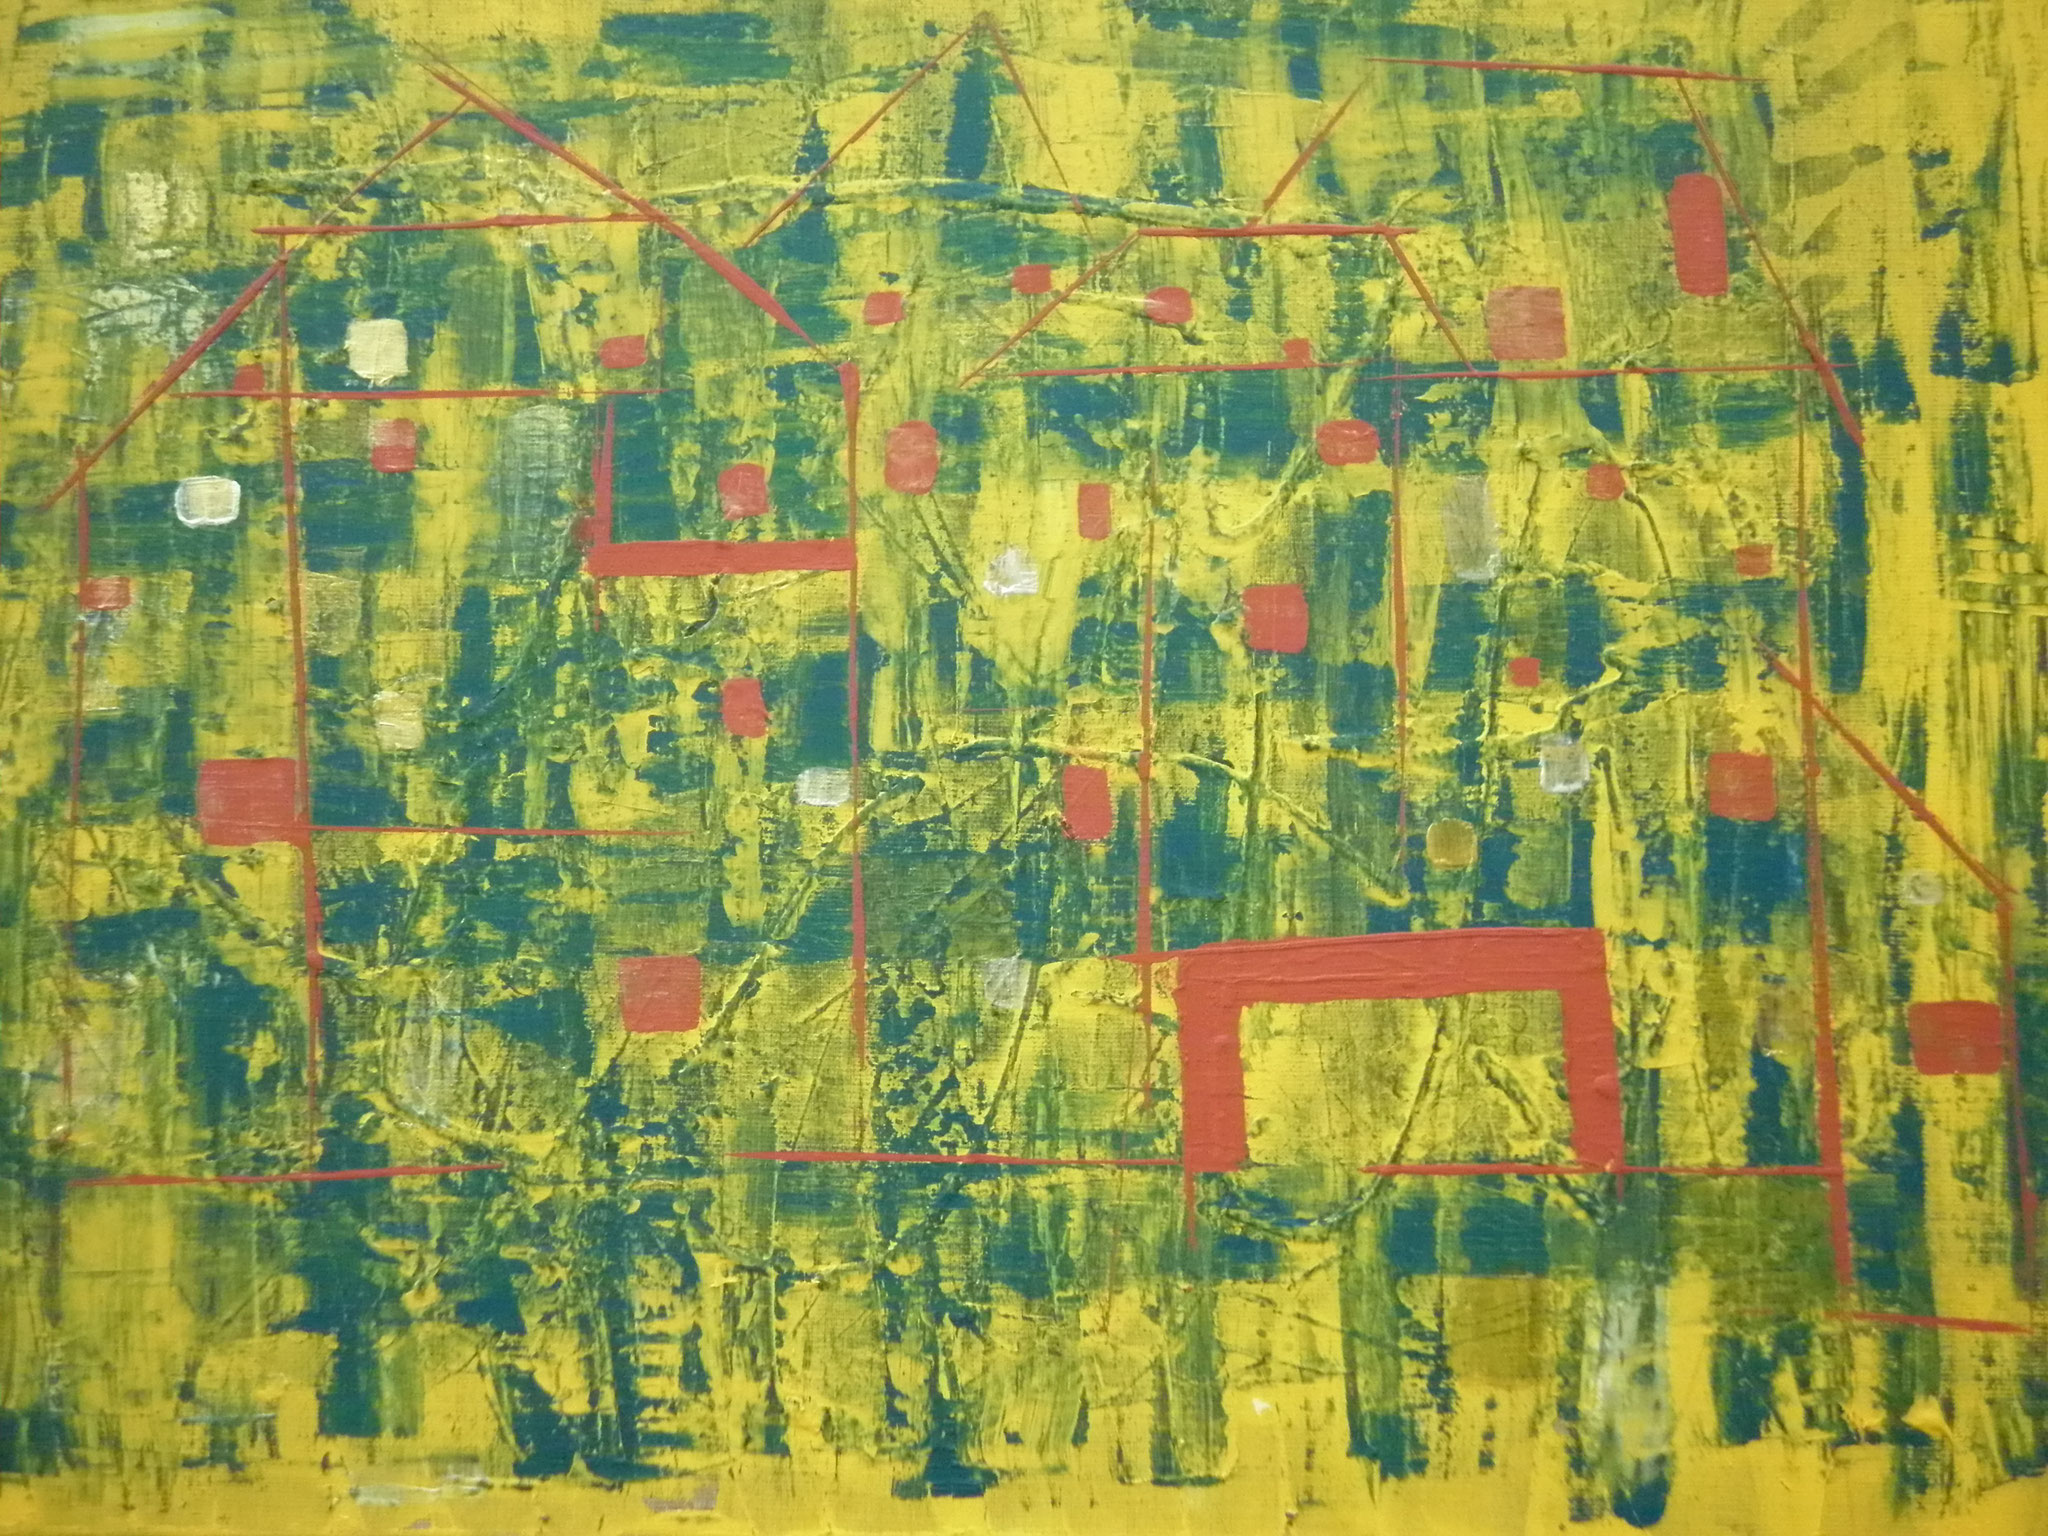 Bild-Nr. 236 Ausblick  © Maß 60 x 80 Acryl/Leinwand auf Keilrahmen